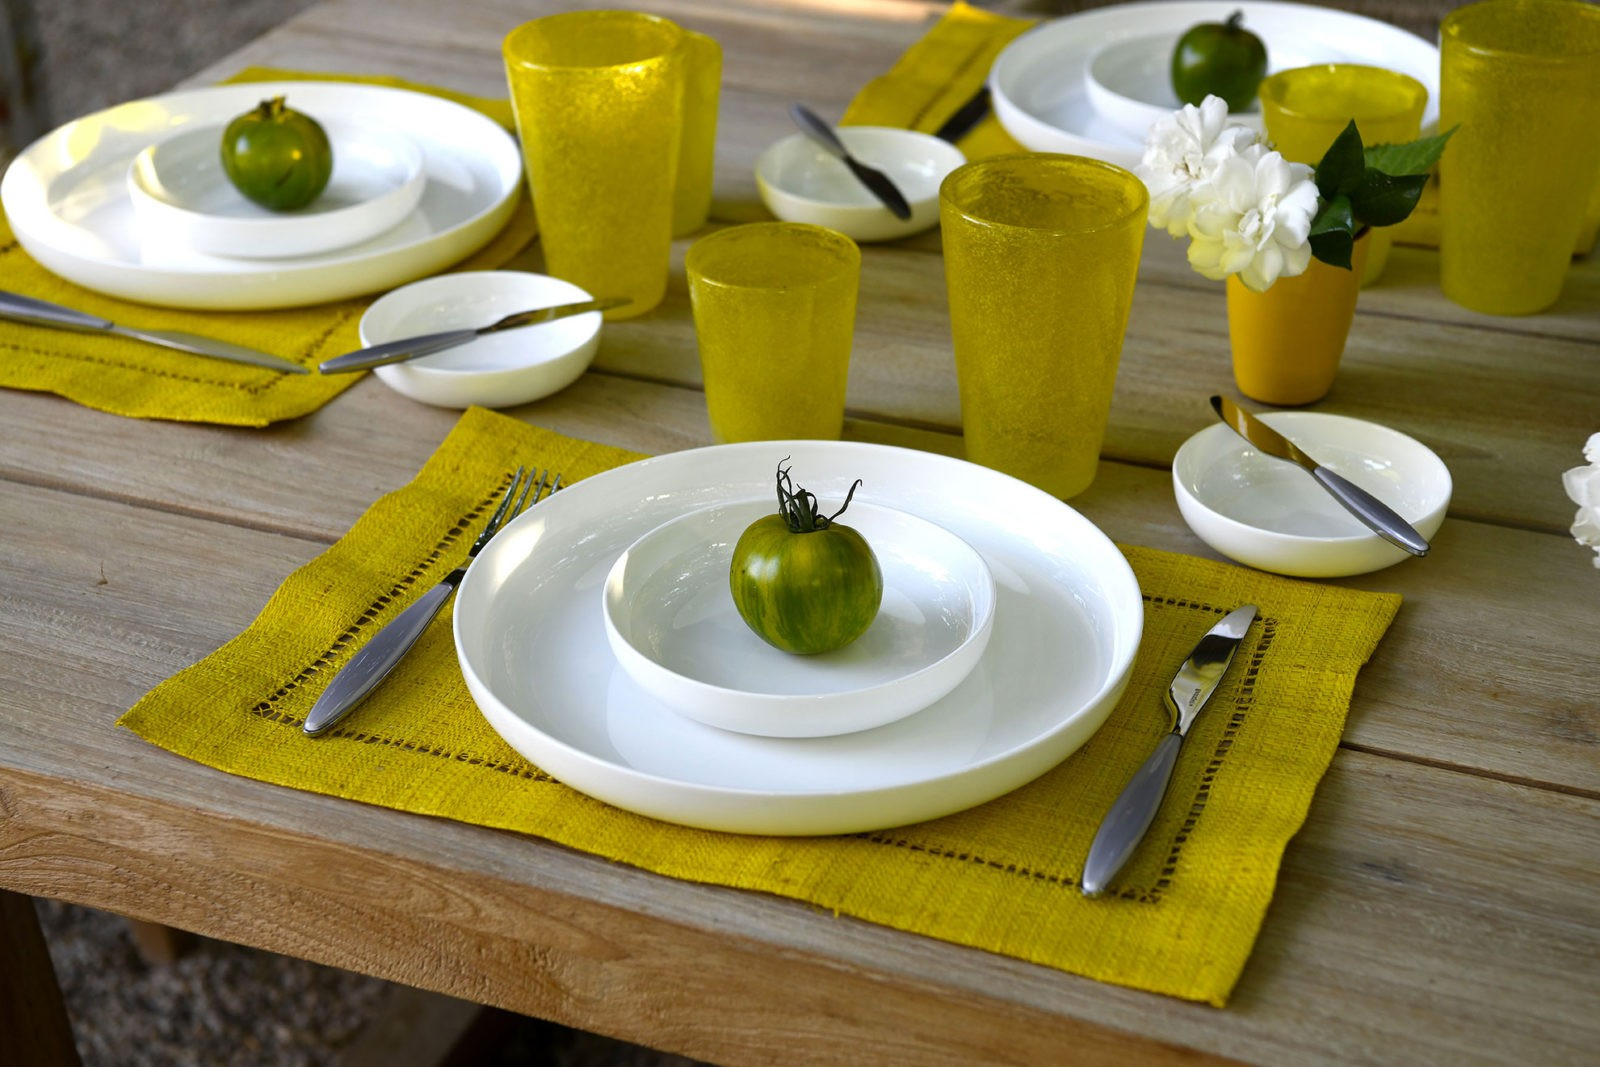 ikigai-table-tomates